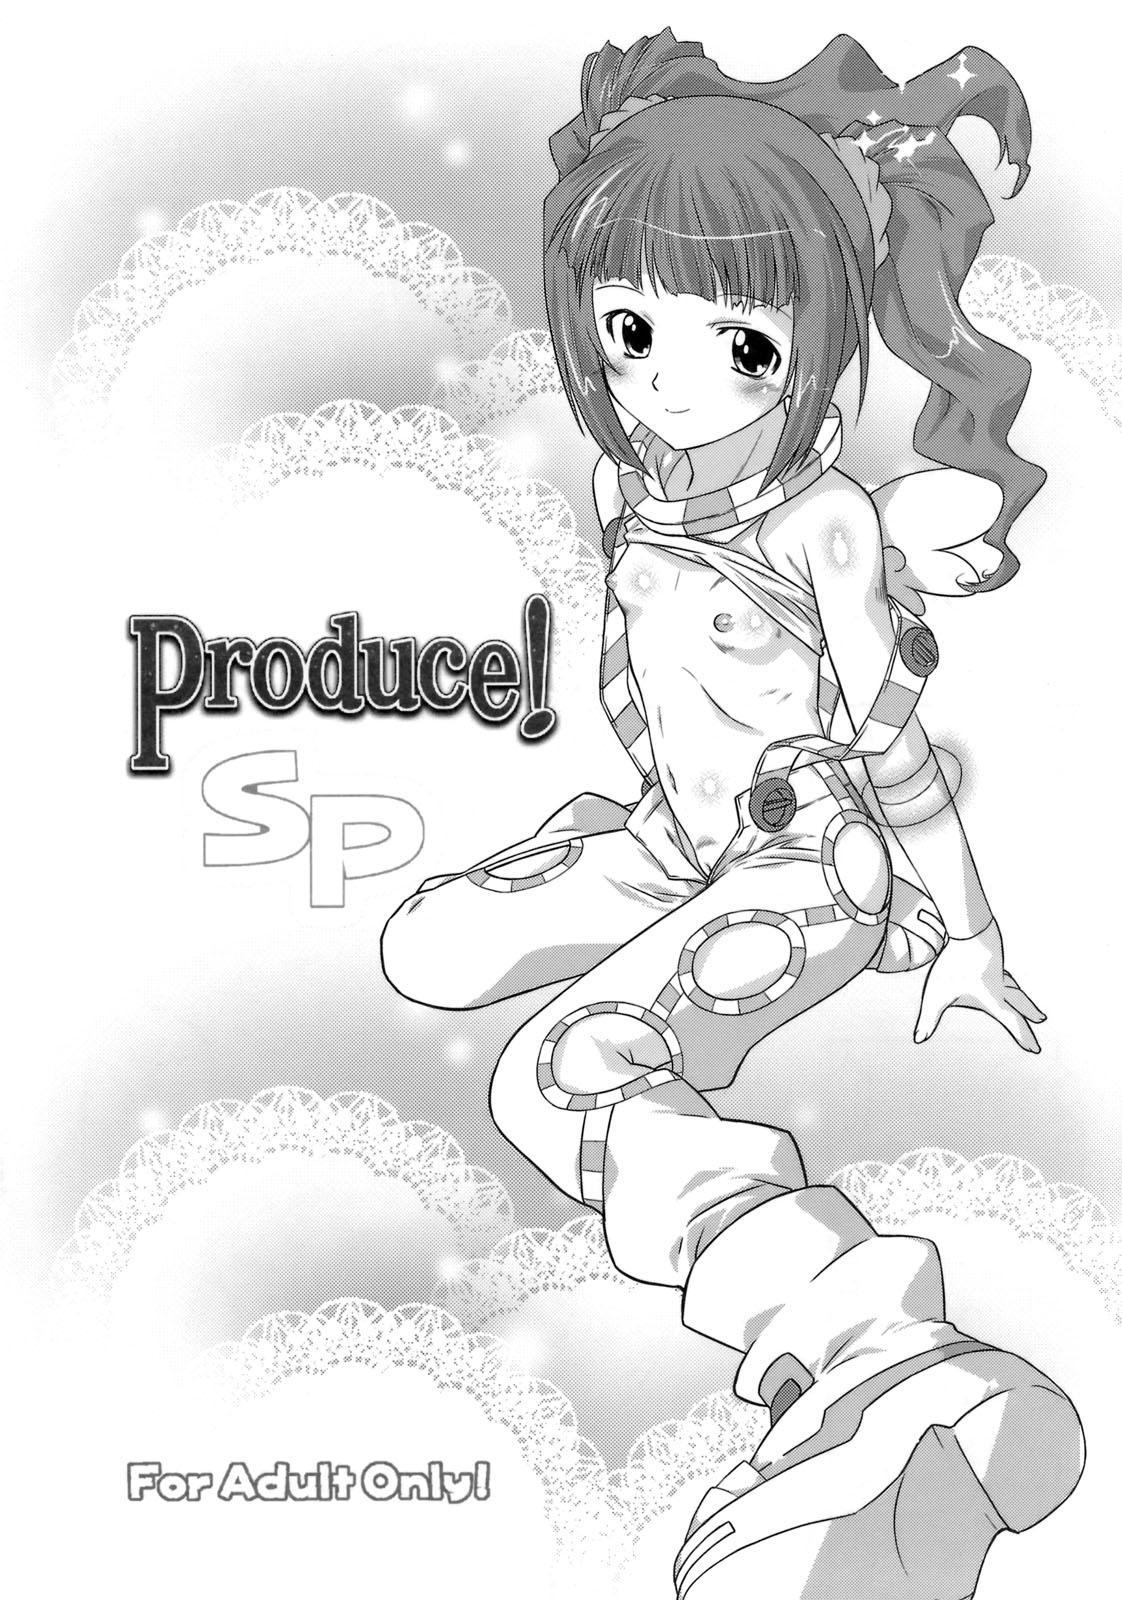 Sweet Produce! SP 2